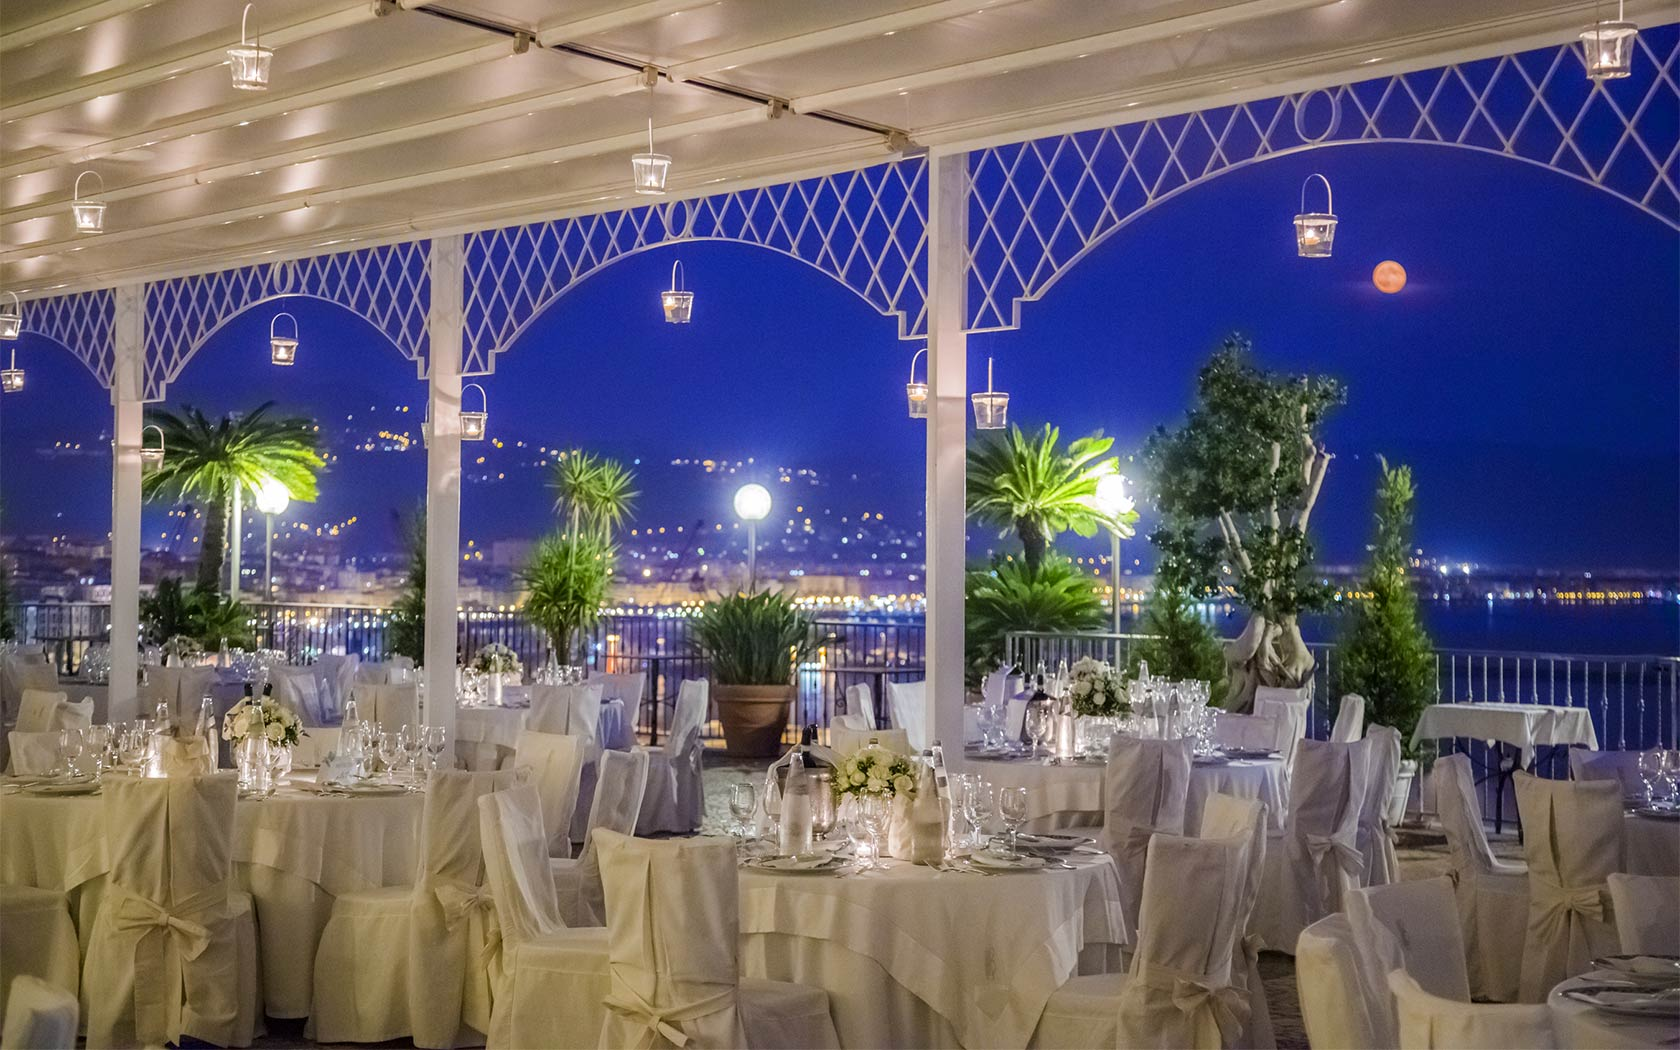 Matrimonio Spiaggia Positano : Matrimonio costiera amalfitana hotel di lusso per matrimoni